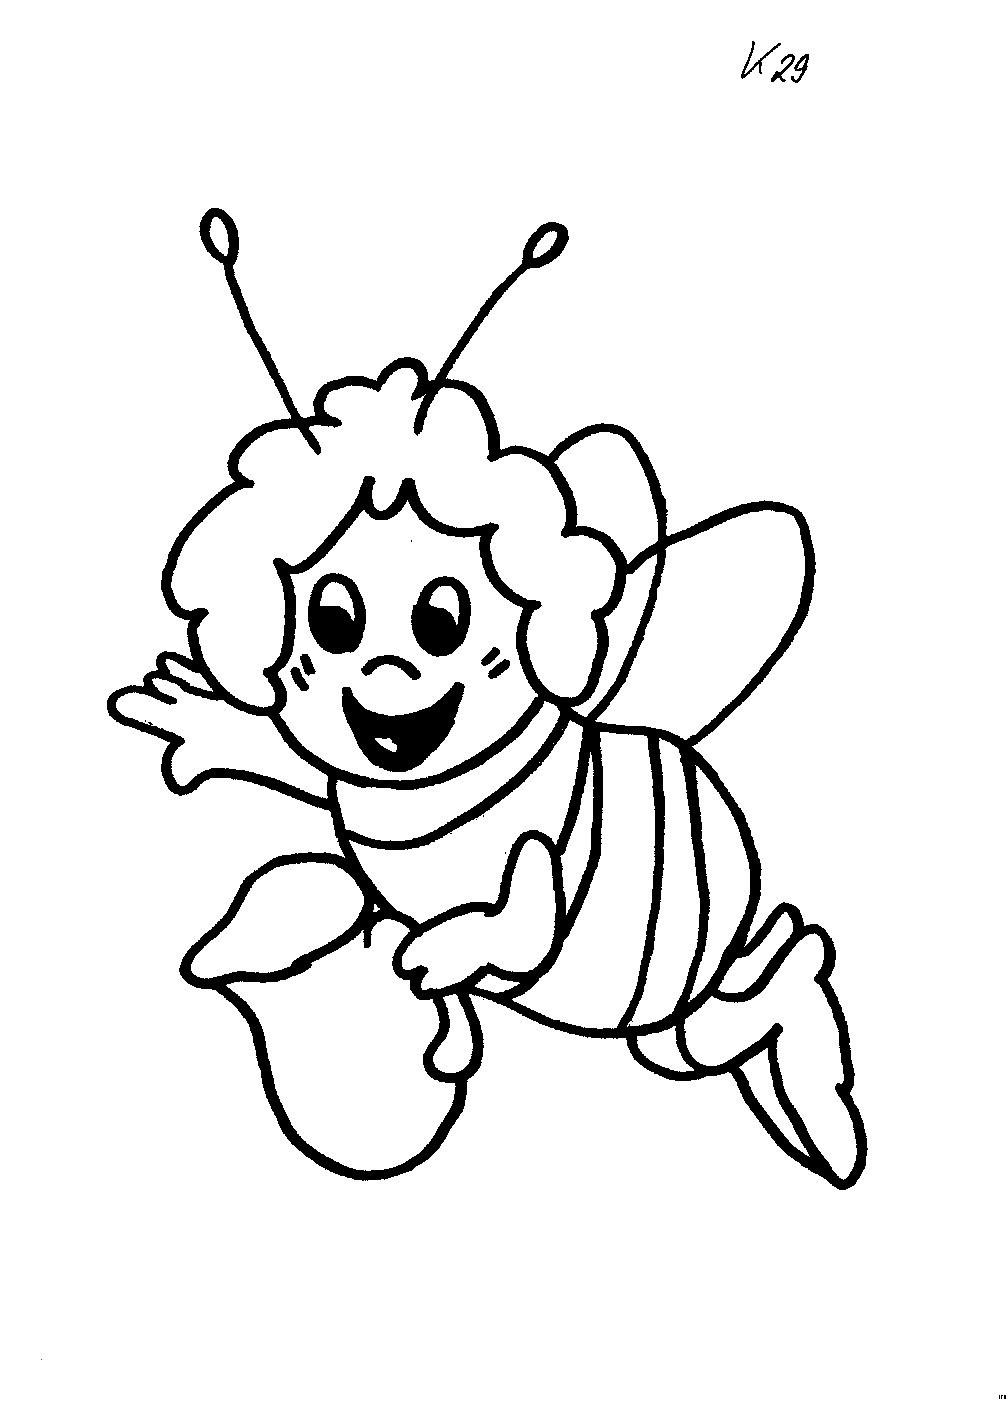 Biene Maja Willi Malvorlage Genial 35 Mops Ausmalbilder Scoredatscore Schön Ausmalbilder Biene Maja Und Stock